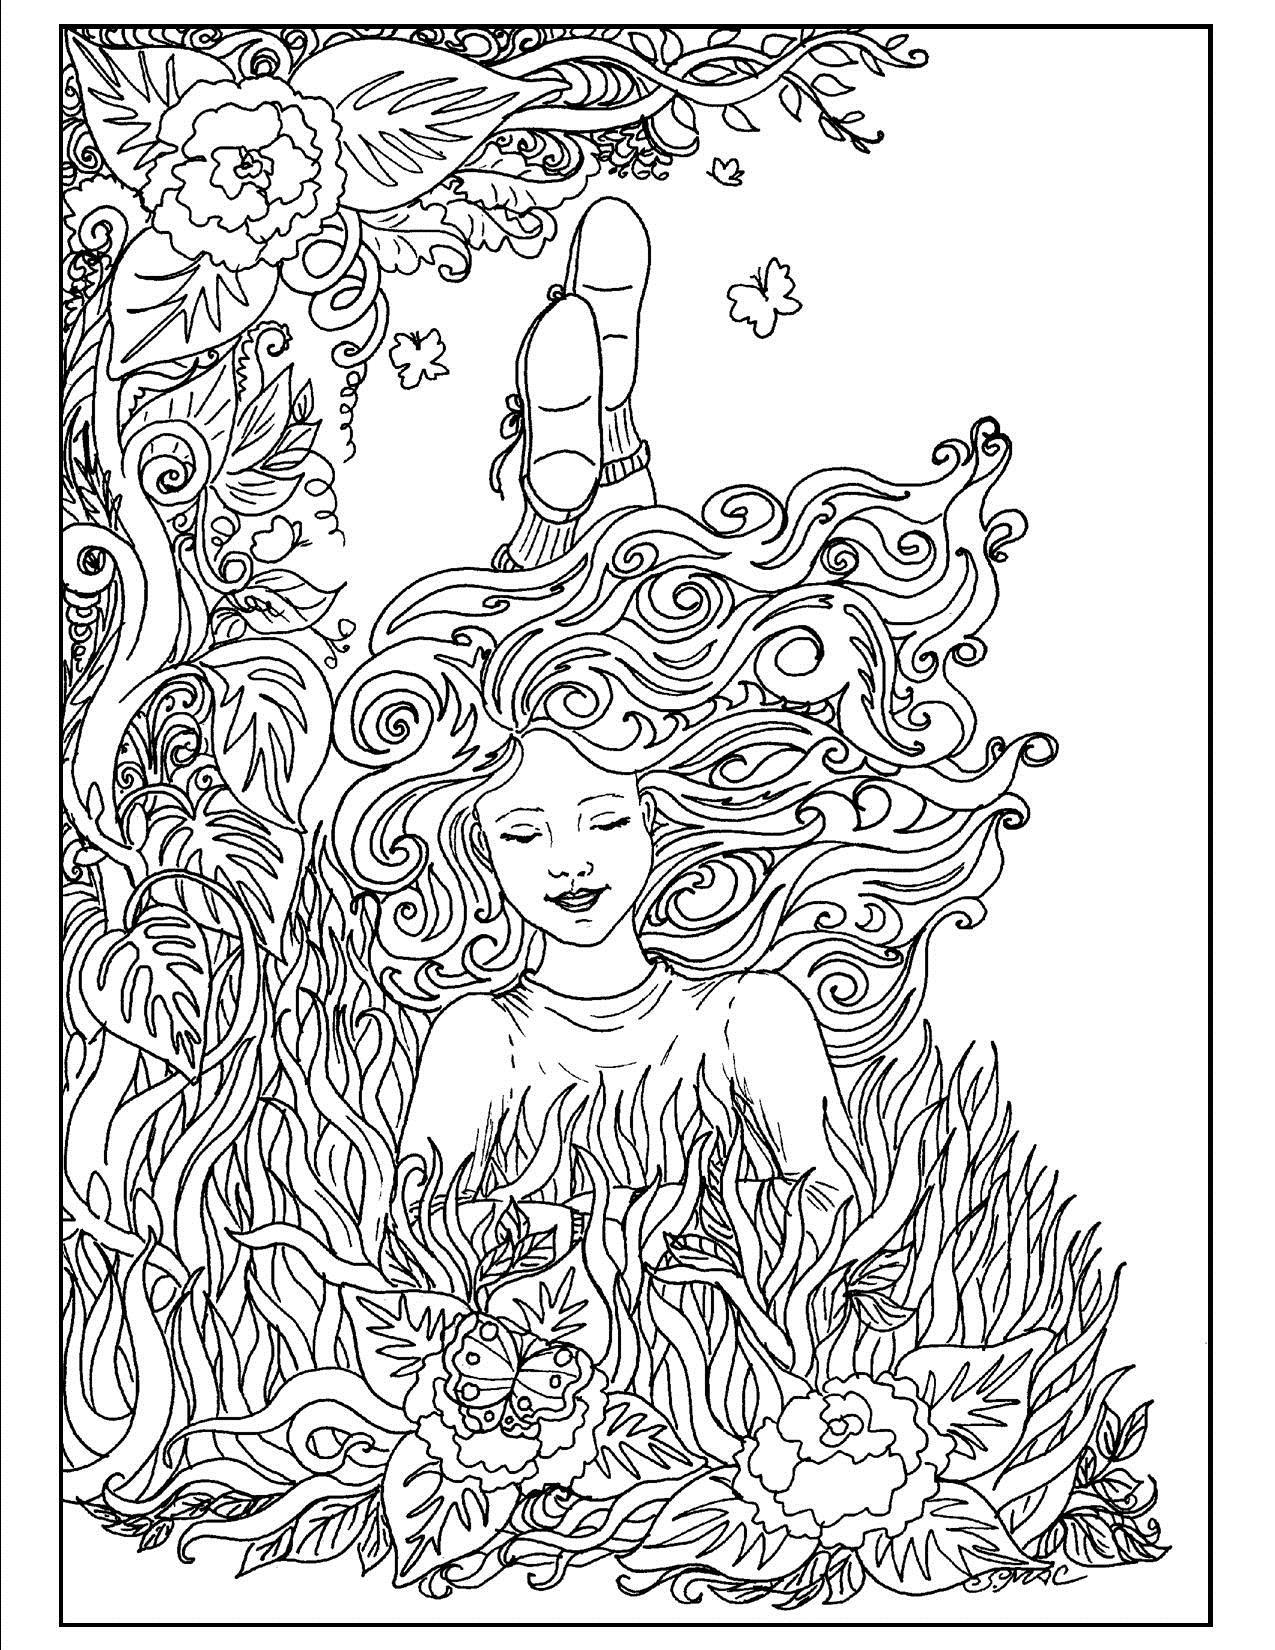 Девушка на клумбе с цветами Красивые раскраски цветов